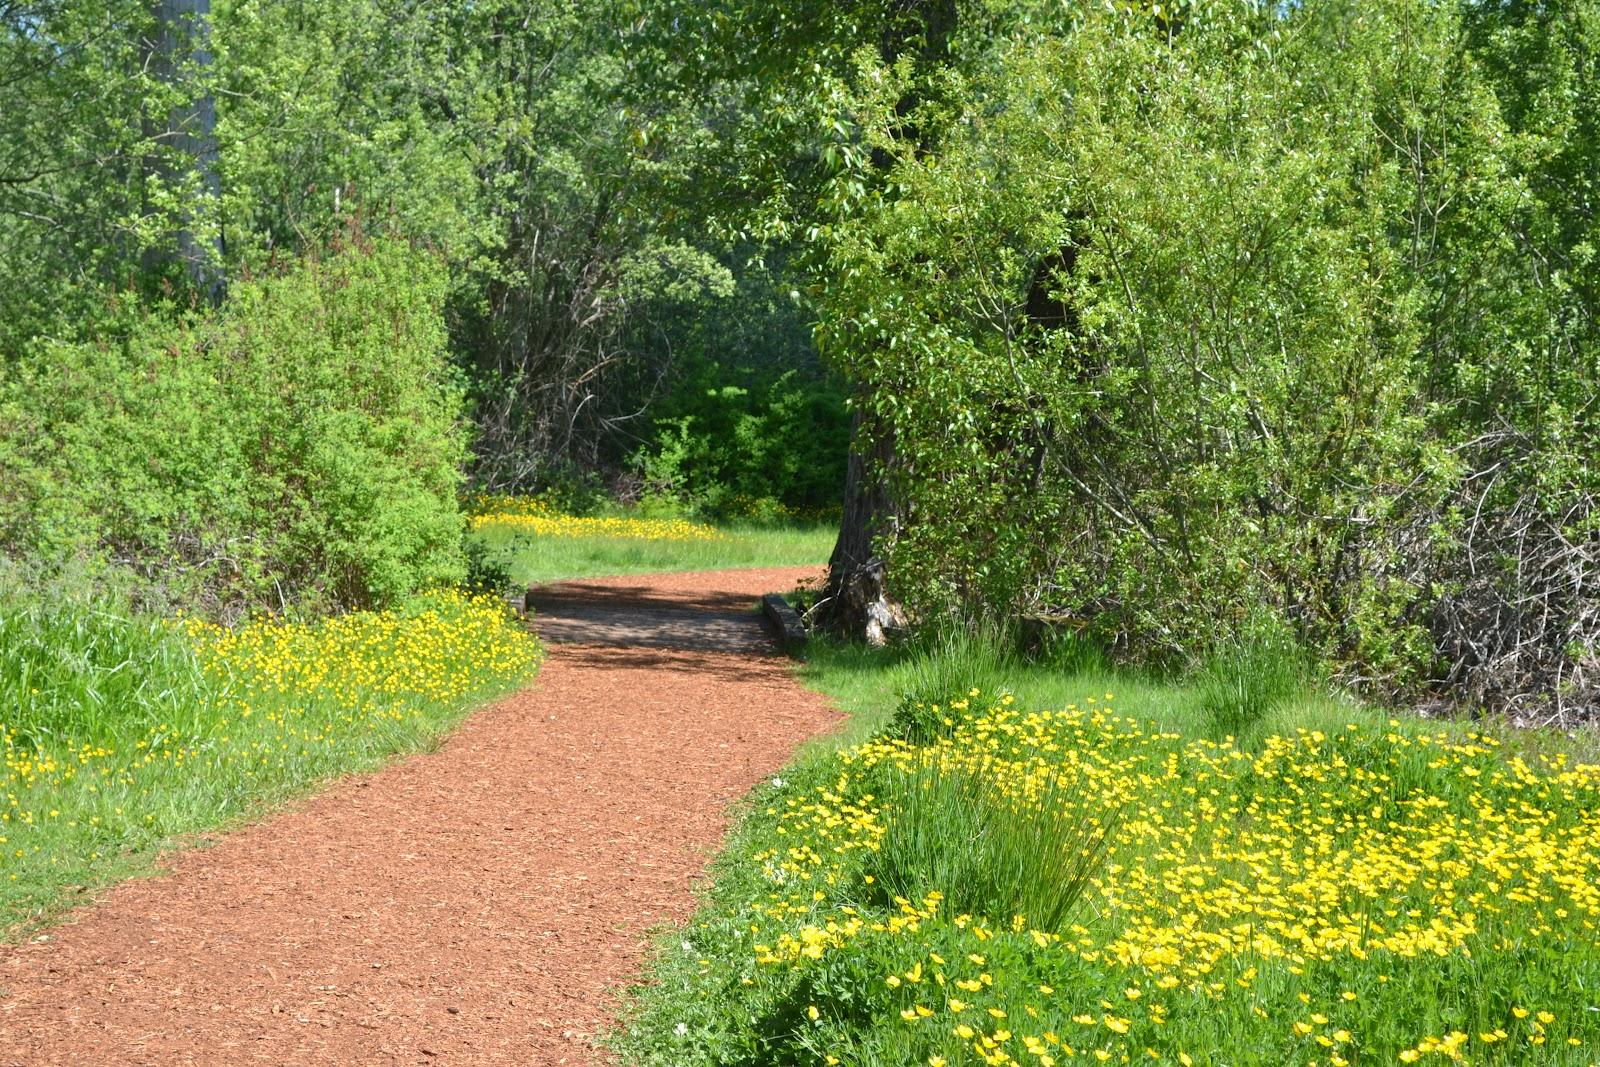 a path worth exploring